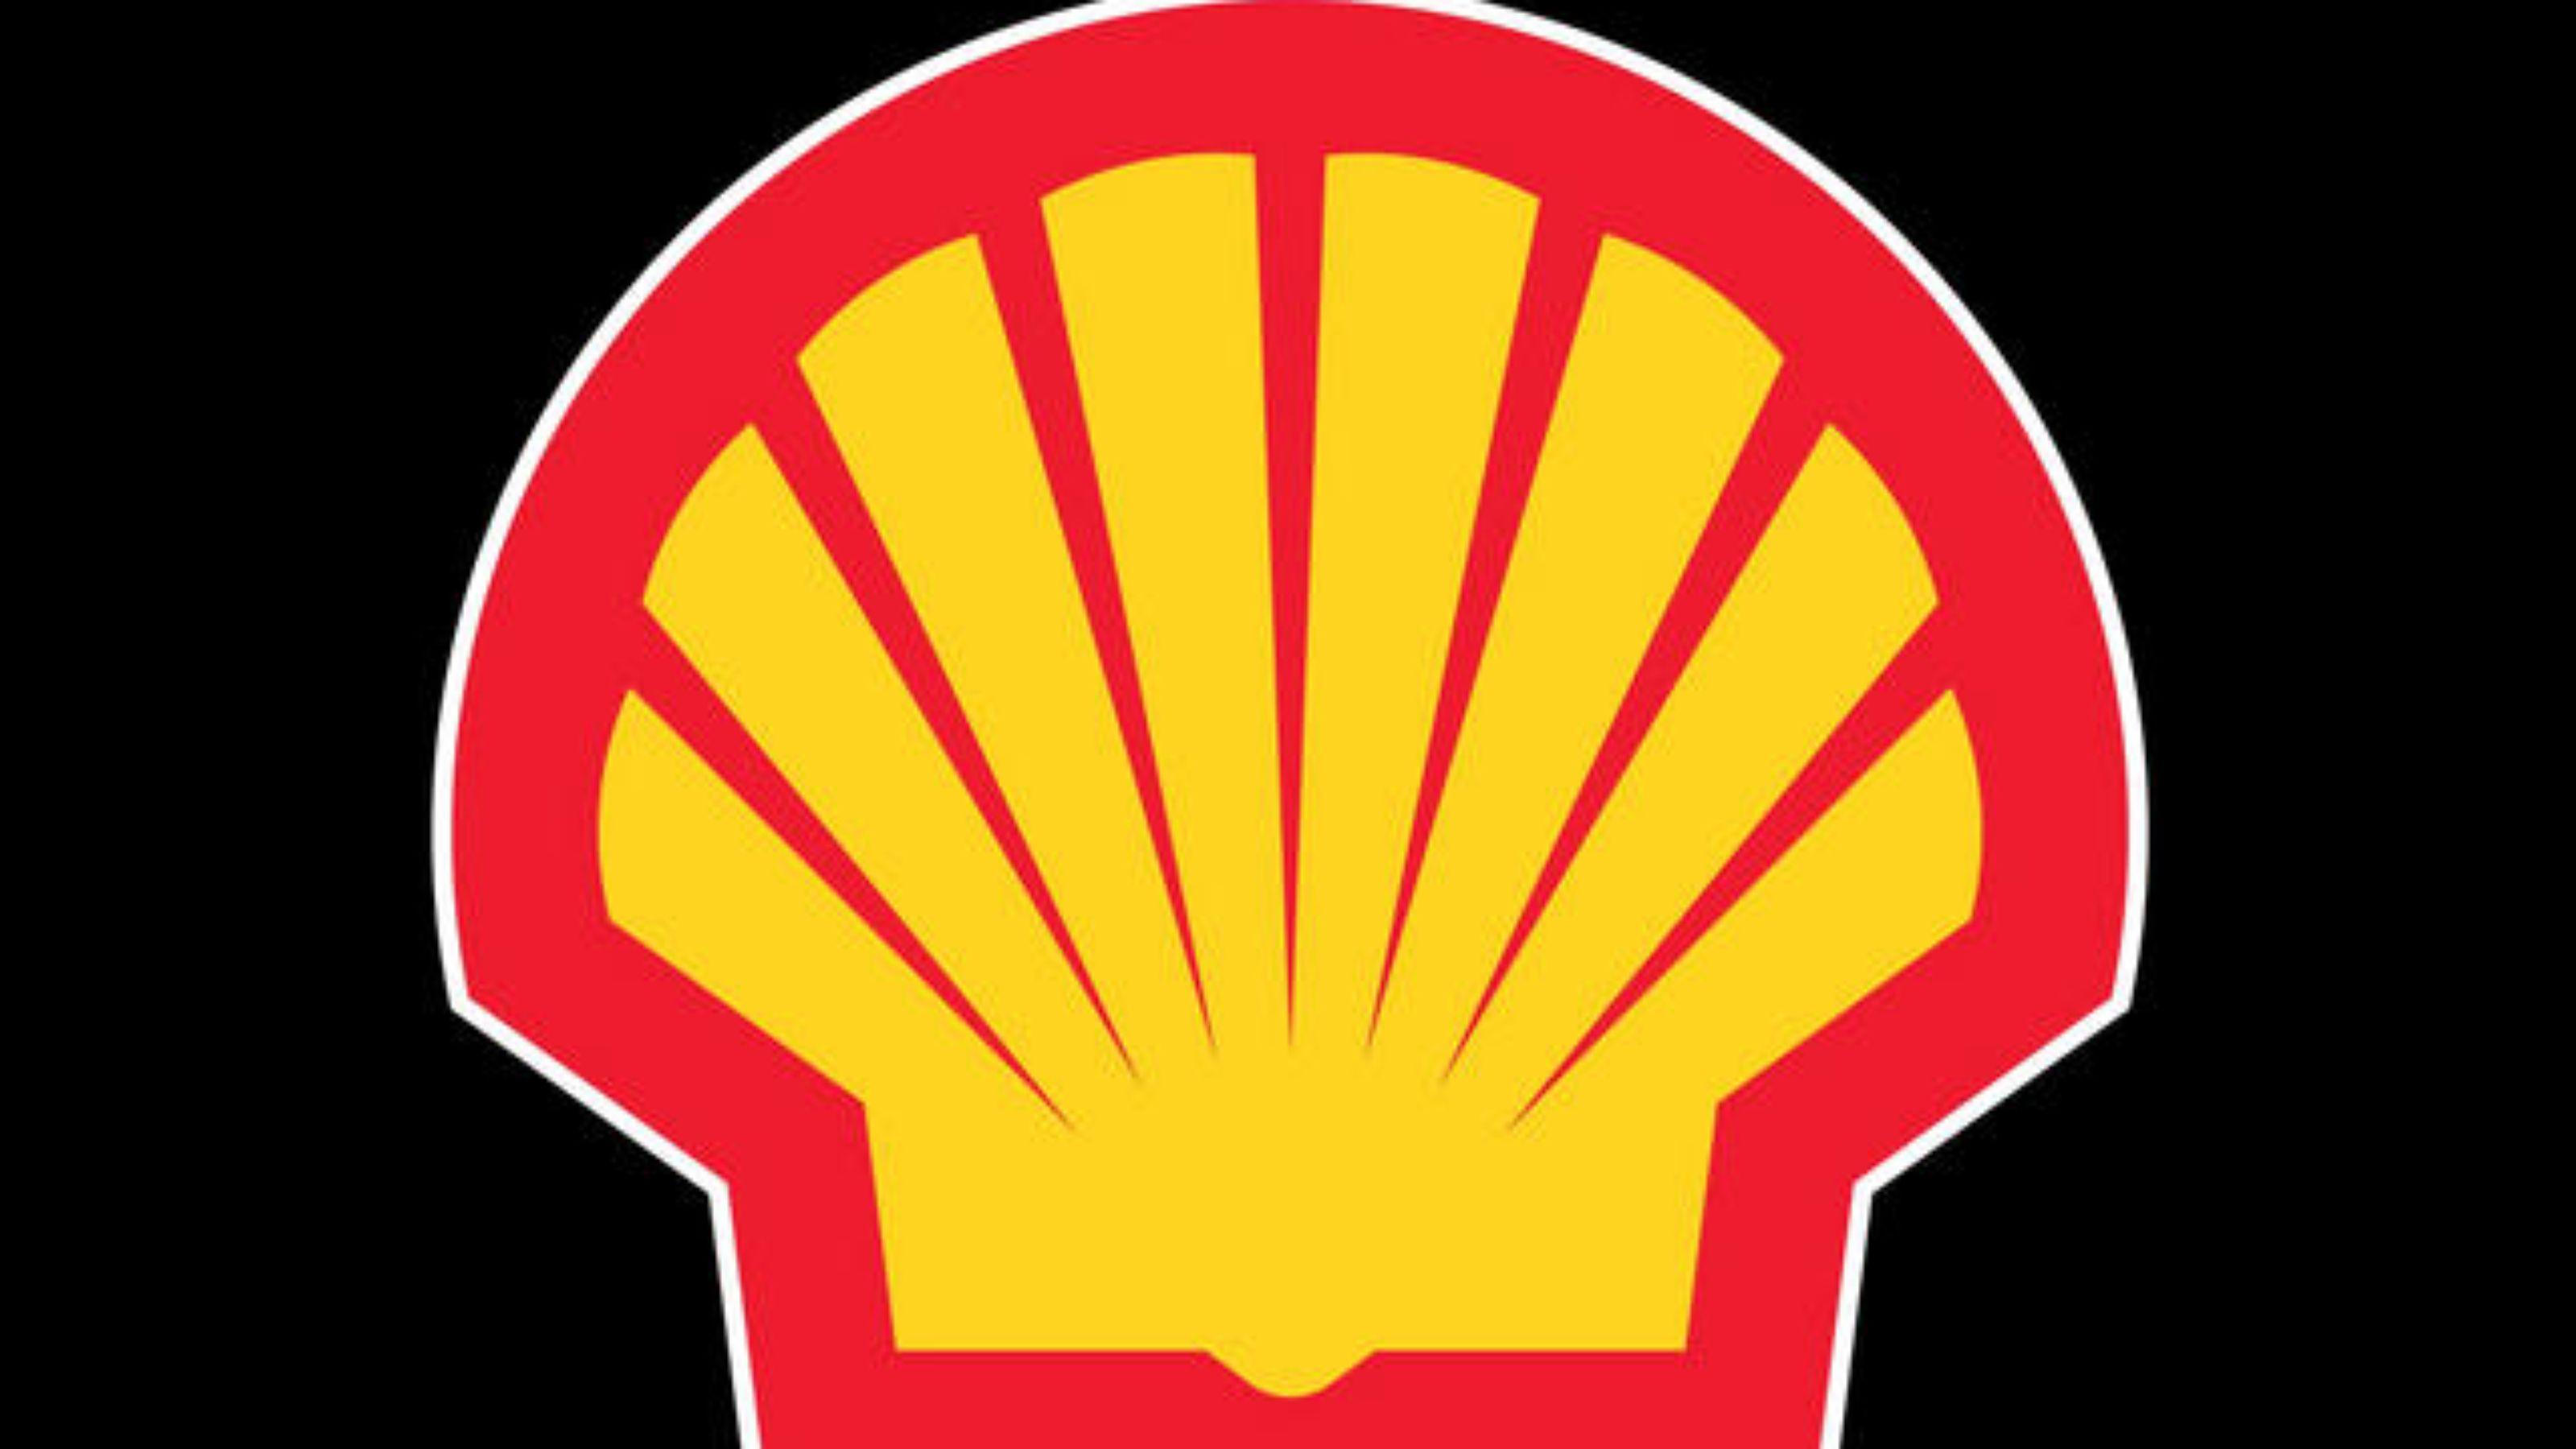 Shell Logos.